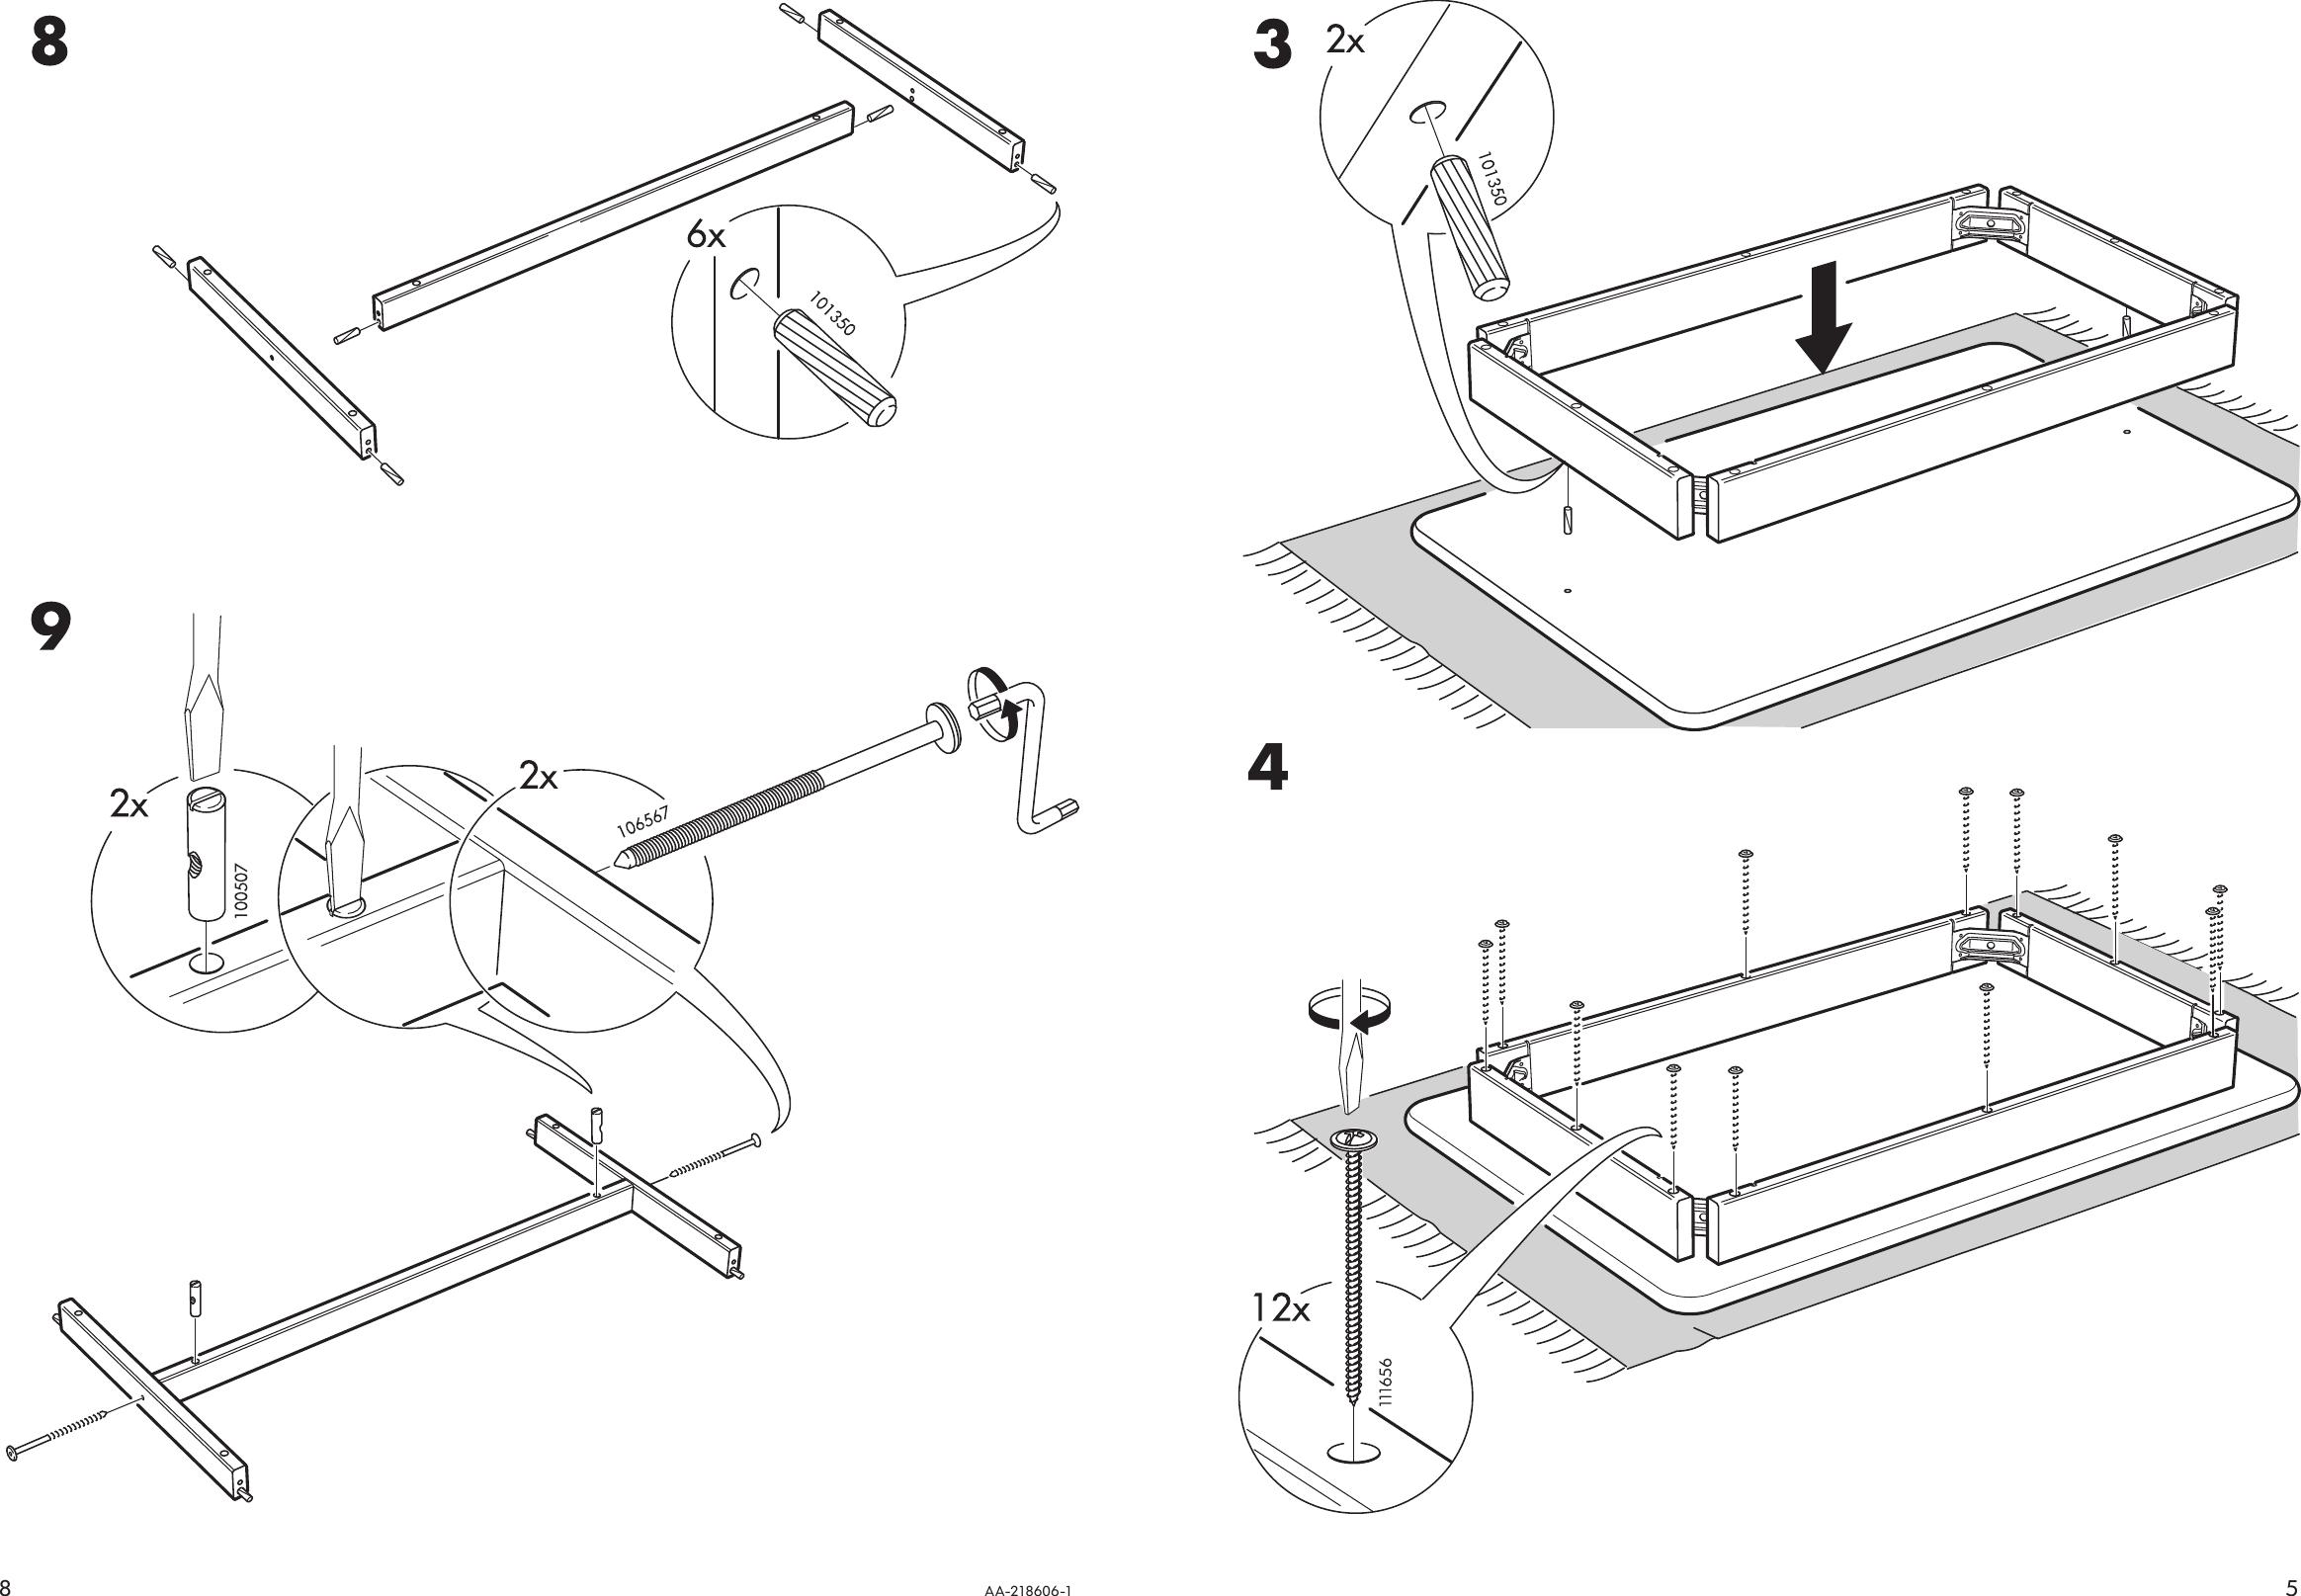 Ikea Leksvik Bar Table 43X28 Assembly Instruction